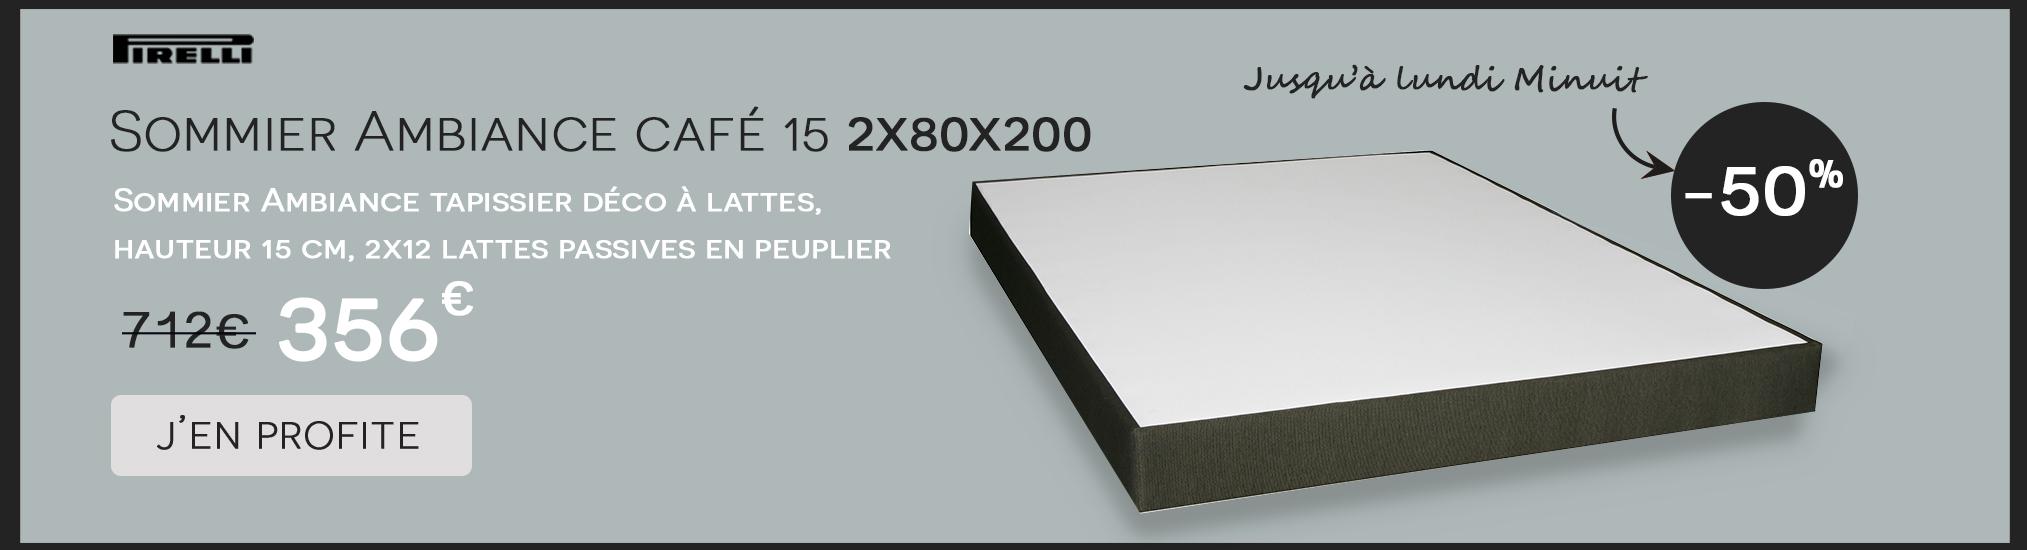 Sommier ambiance Pirelli 2x80x200